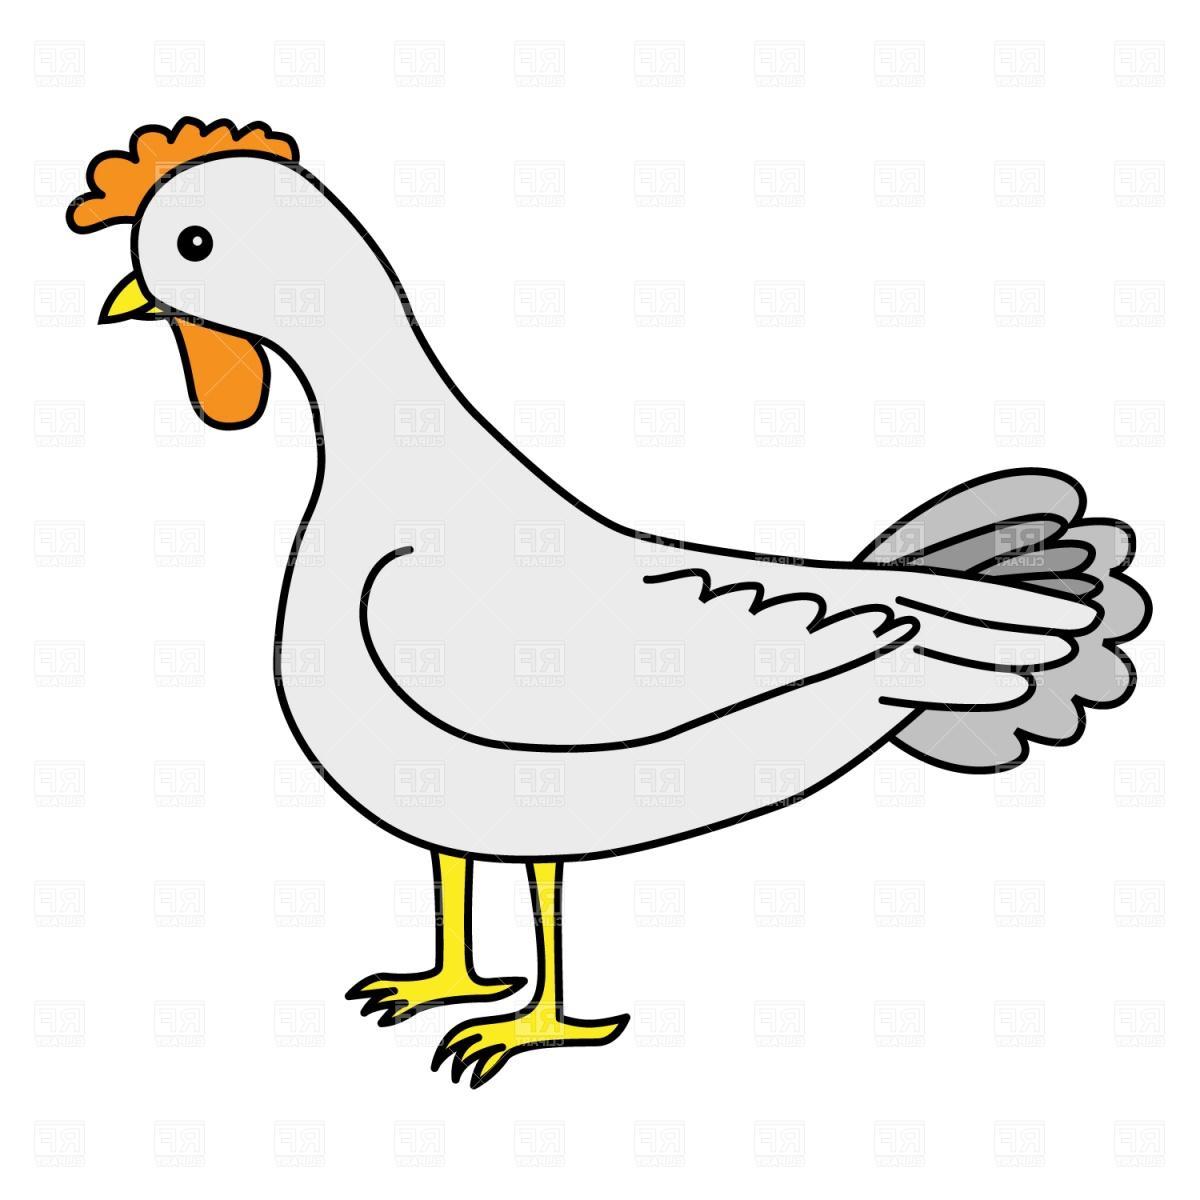 1200x1200 Best Free Cartoon Hen Clip Art Drawing Free Vector Art, Images